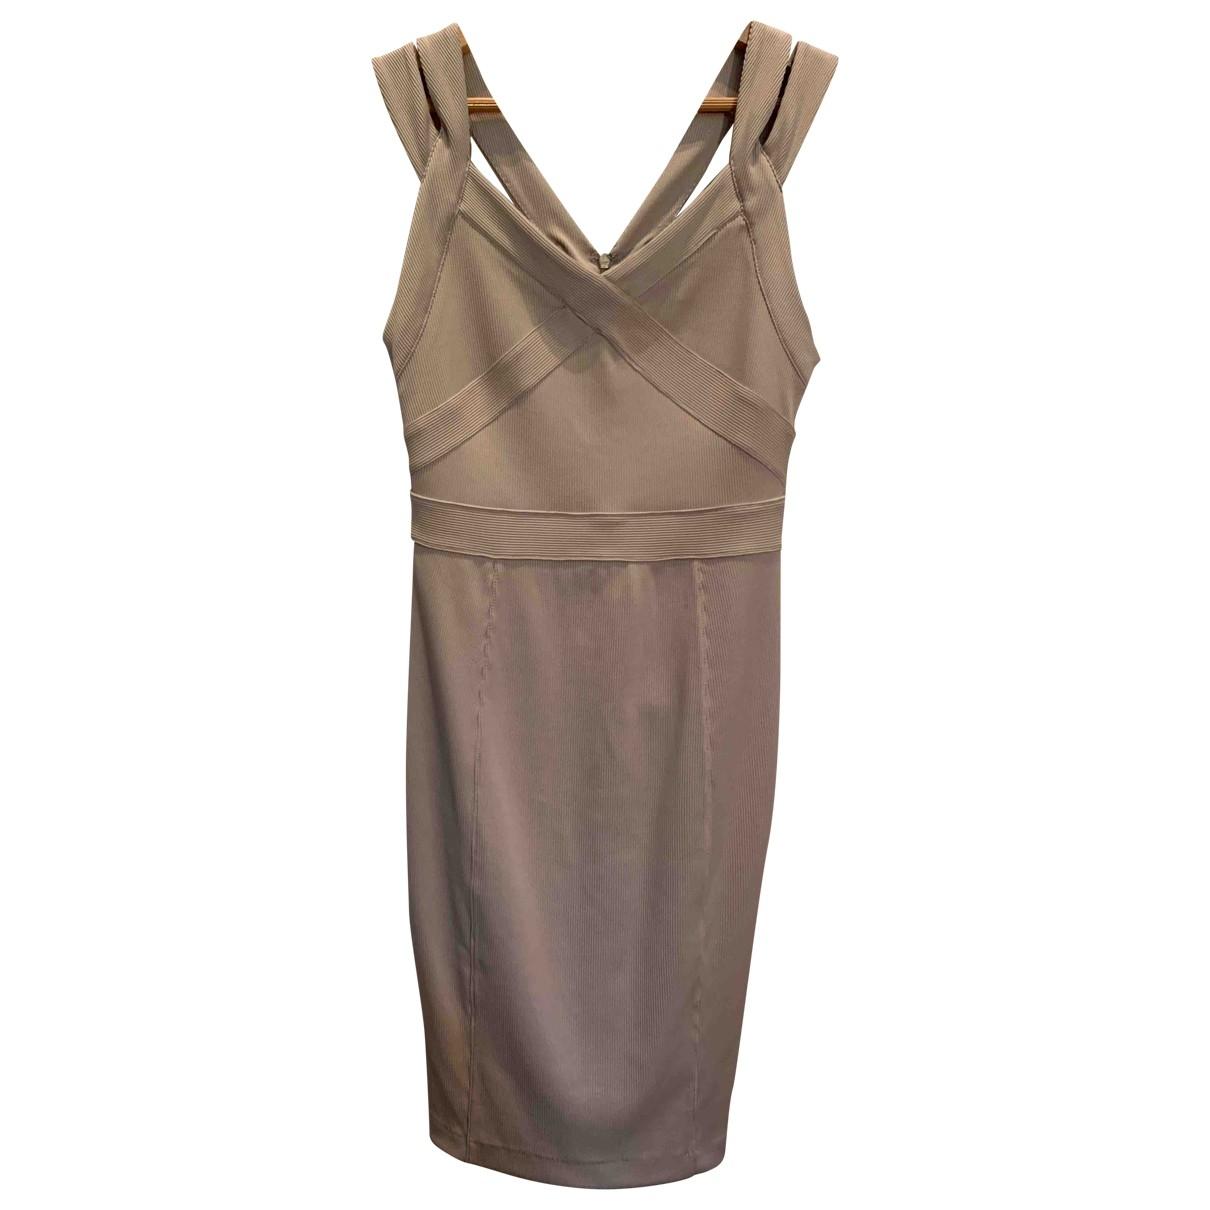 Emporio Armani \N Beige dress for Women S International